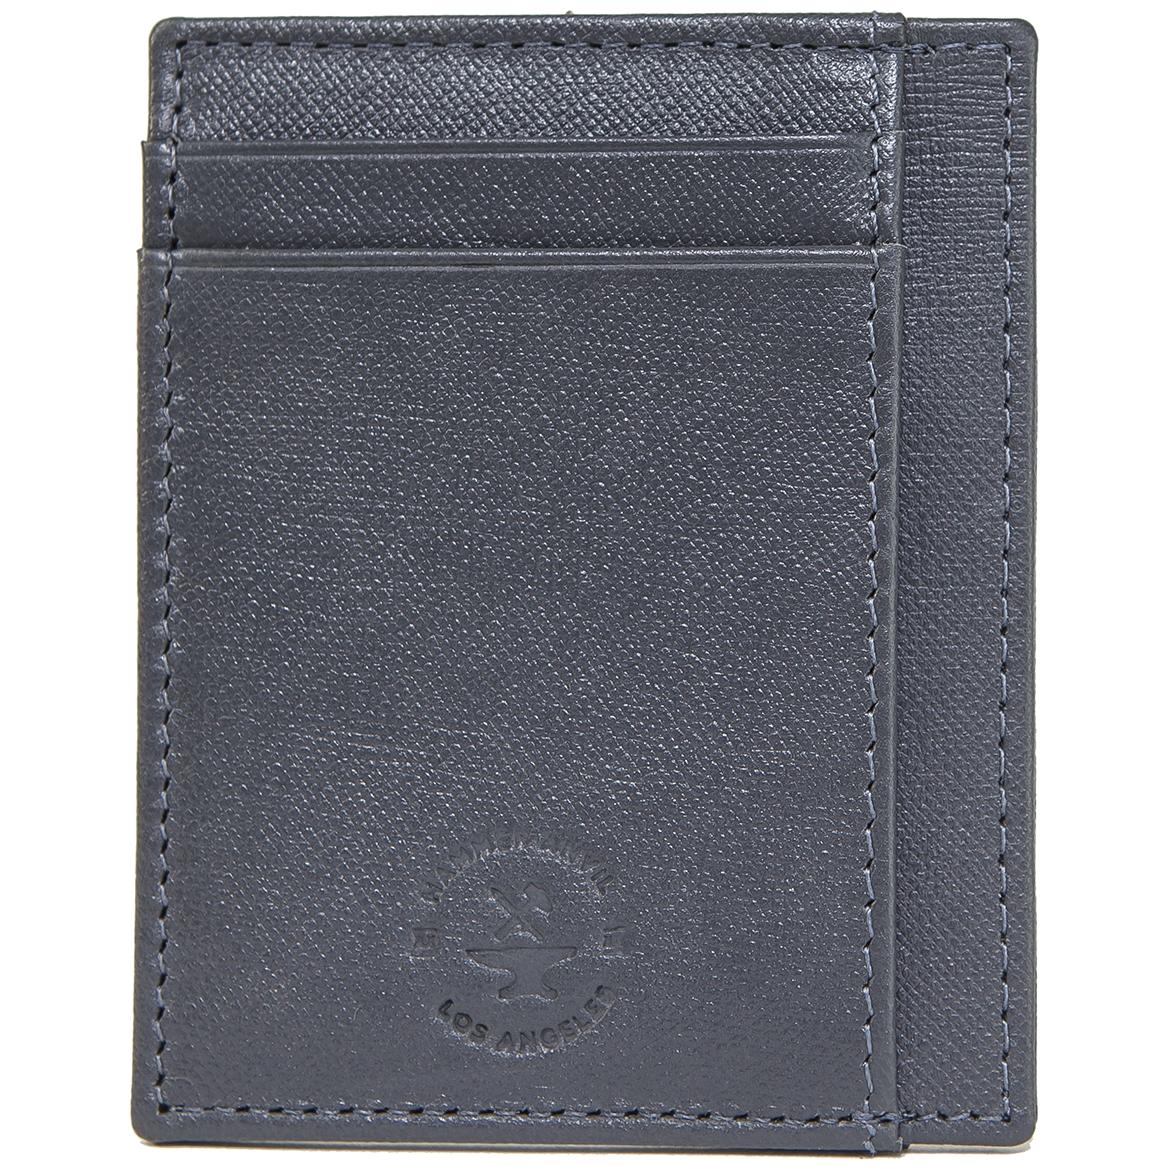 miniature 54 - Hammer-Anvil-Minimalist-Front-Pocket-Wallet-RFID-Blocking-Thin-Leather-Card-Case